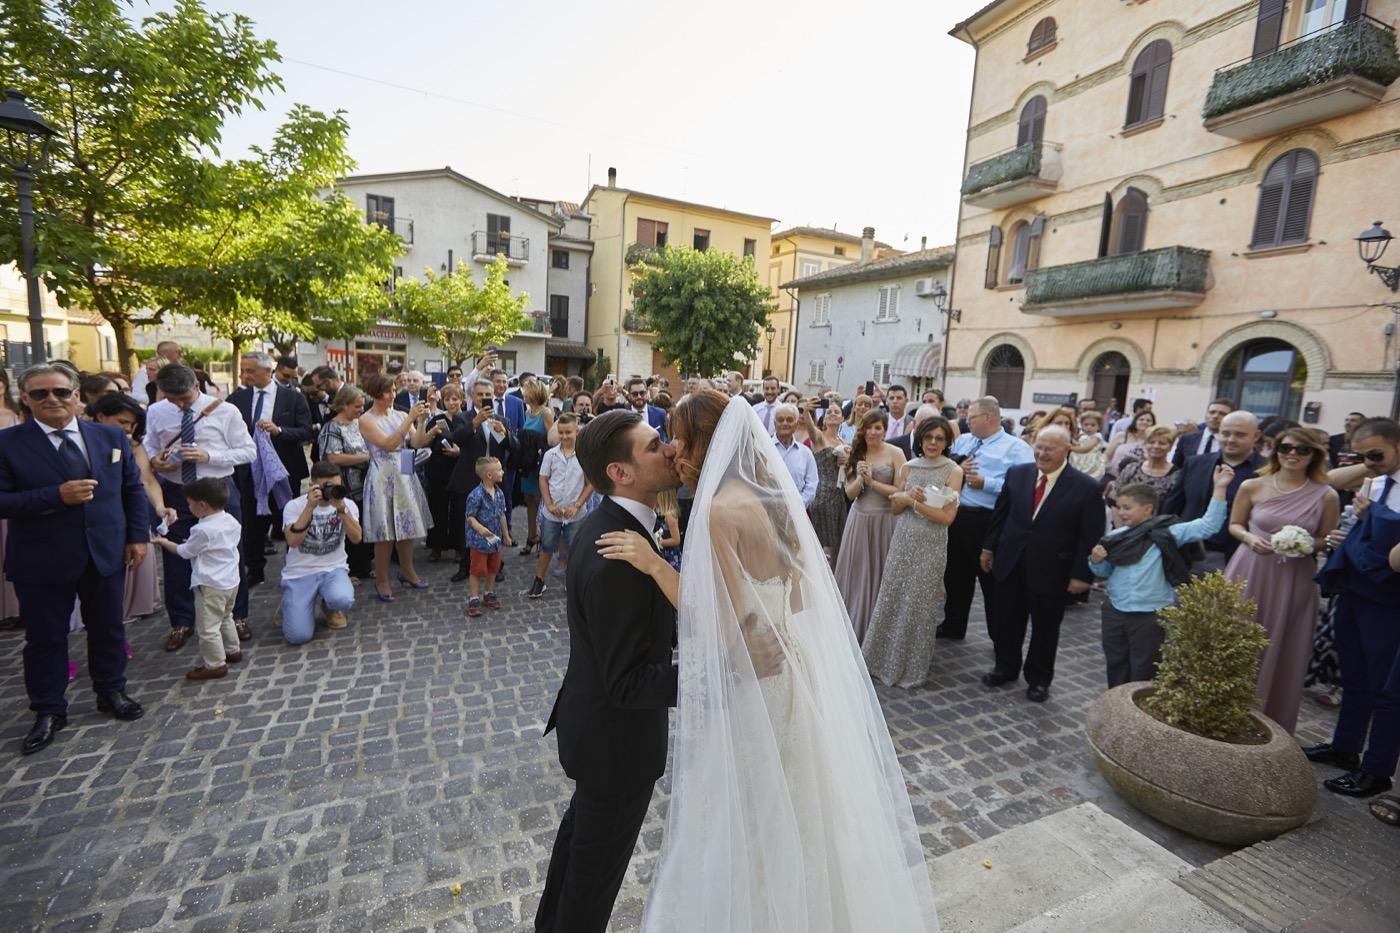 Claudio-Coppola-wedding-photographer-abbazia-7-frati-piegaro-58